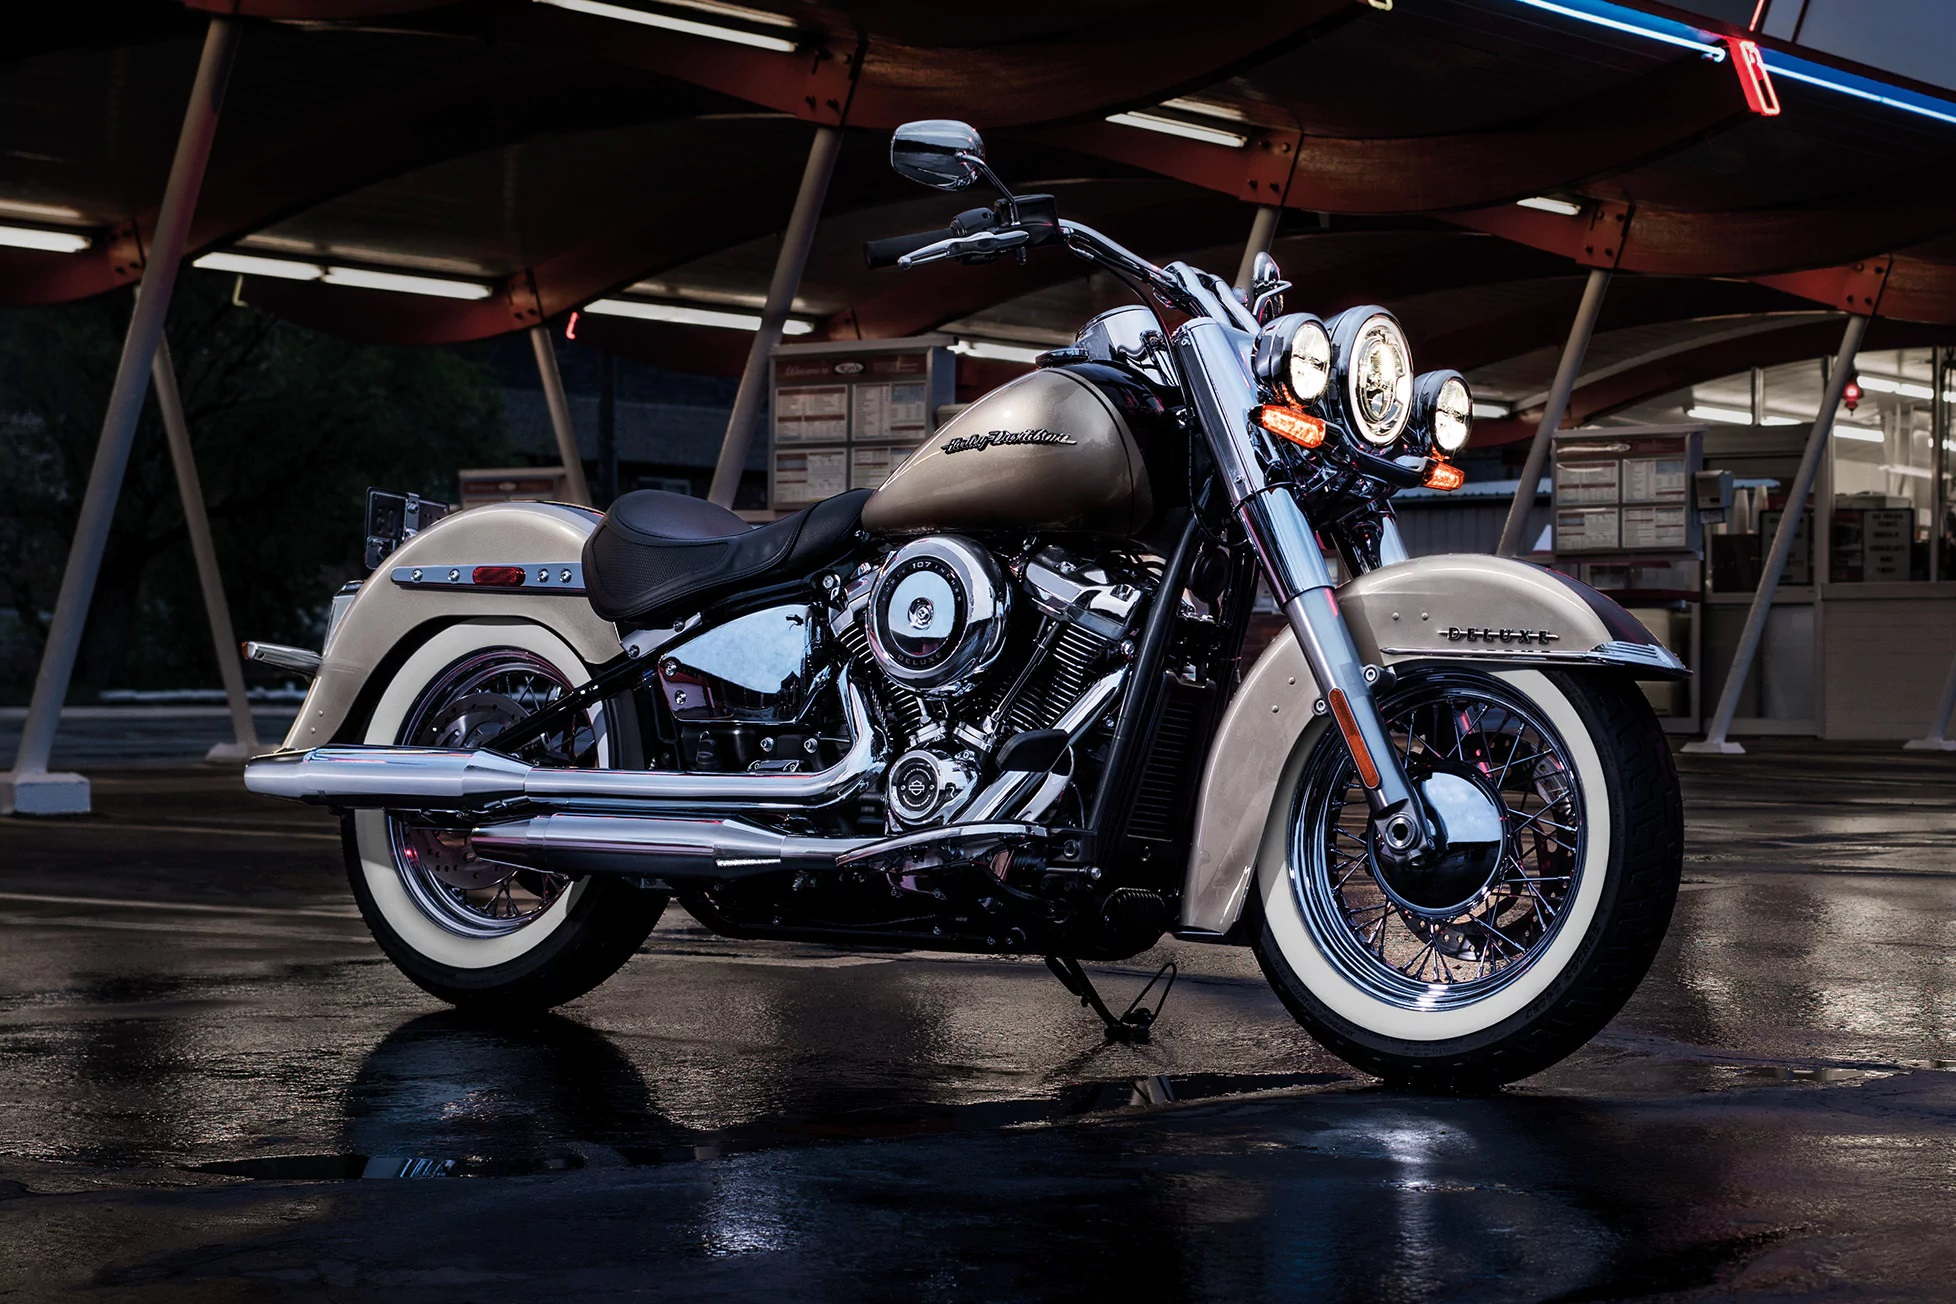 Articles Sun Harley Davidson Denver Colorado Pink Motorcycle New 2018 Softail Motorcycles